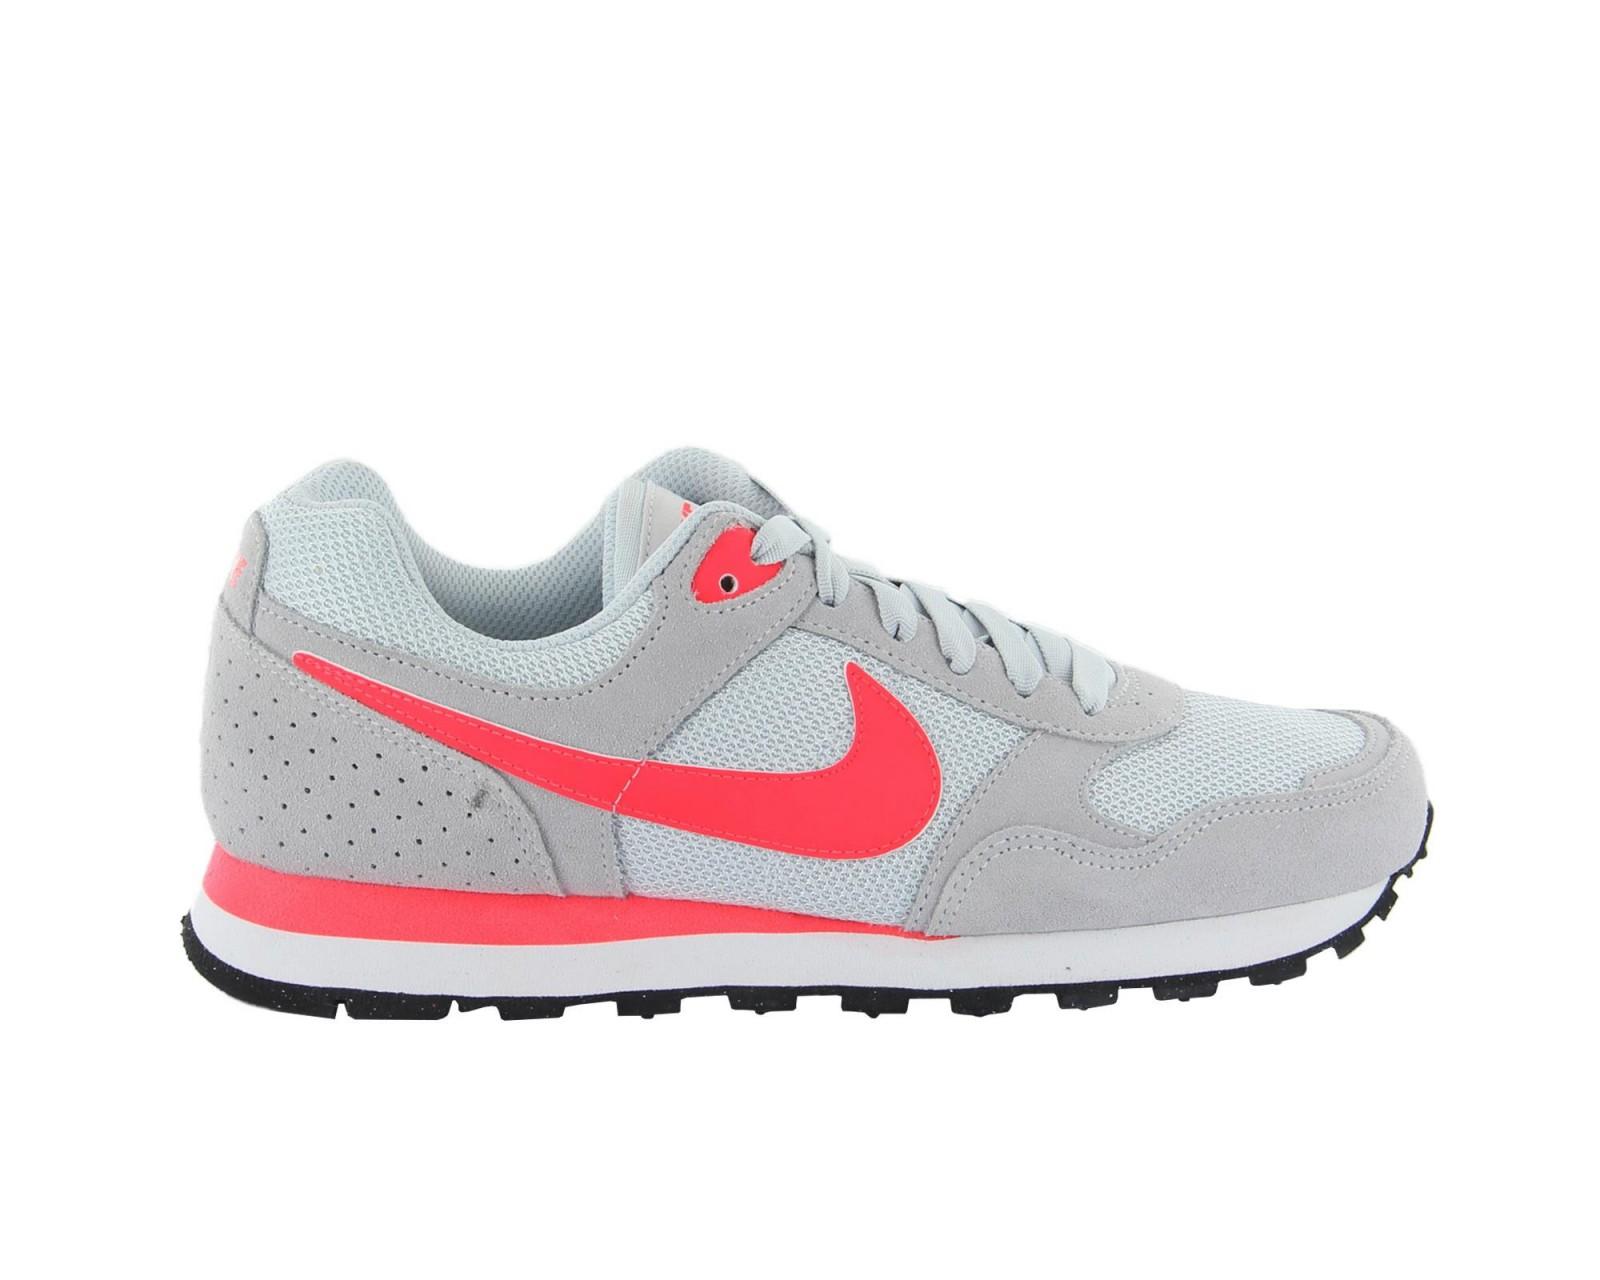 Dámské boty Nike WMNS MD RUNNER  d7ccfcc1bd3